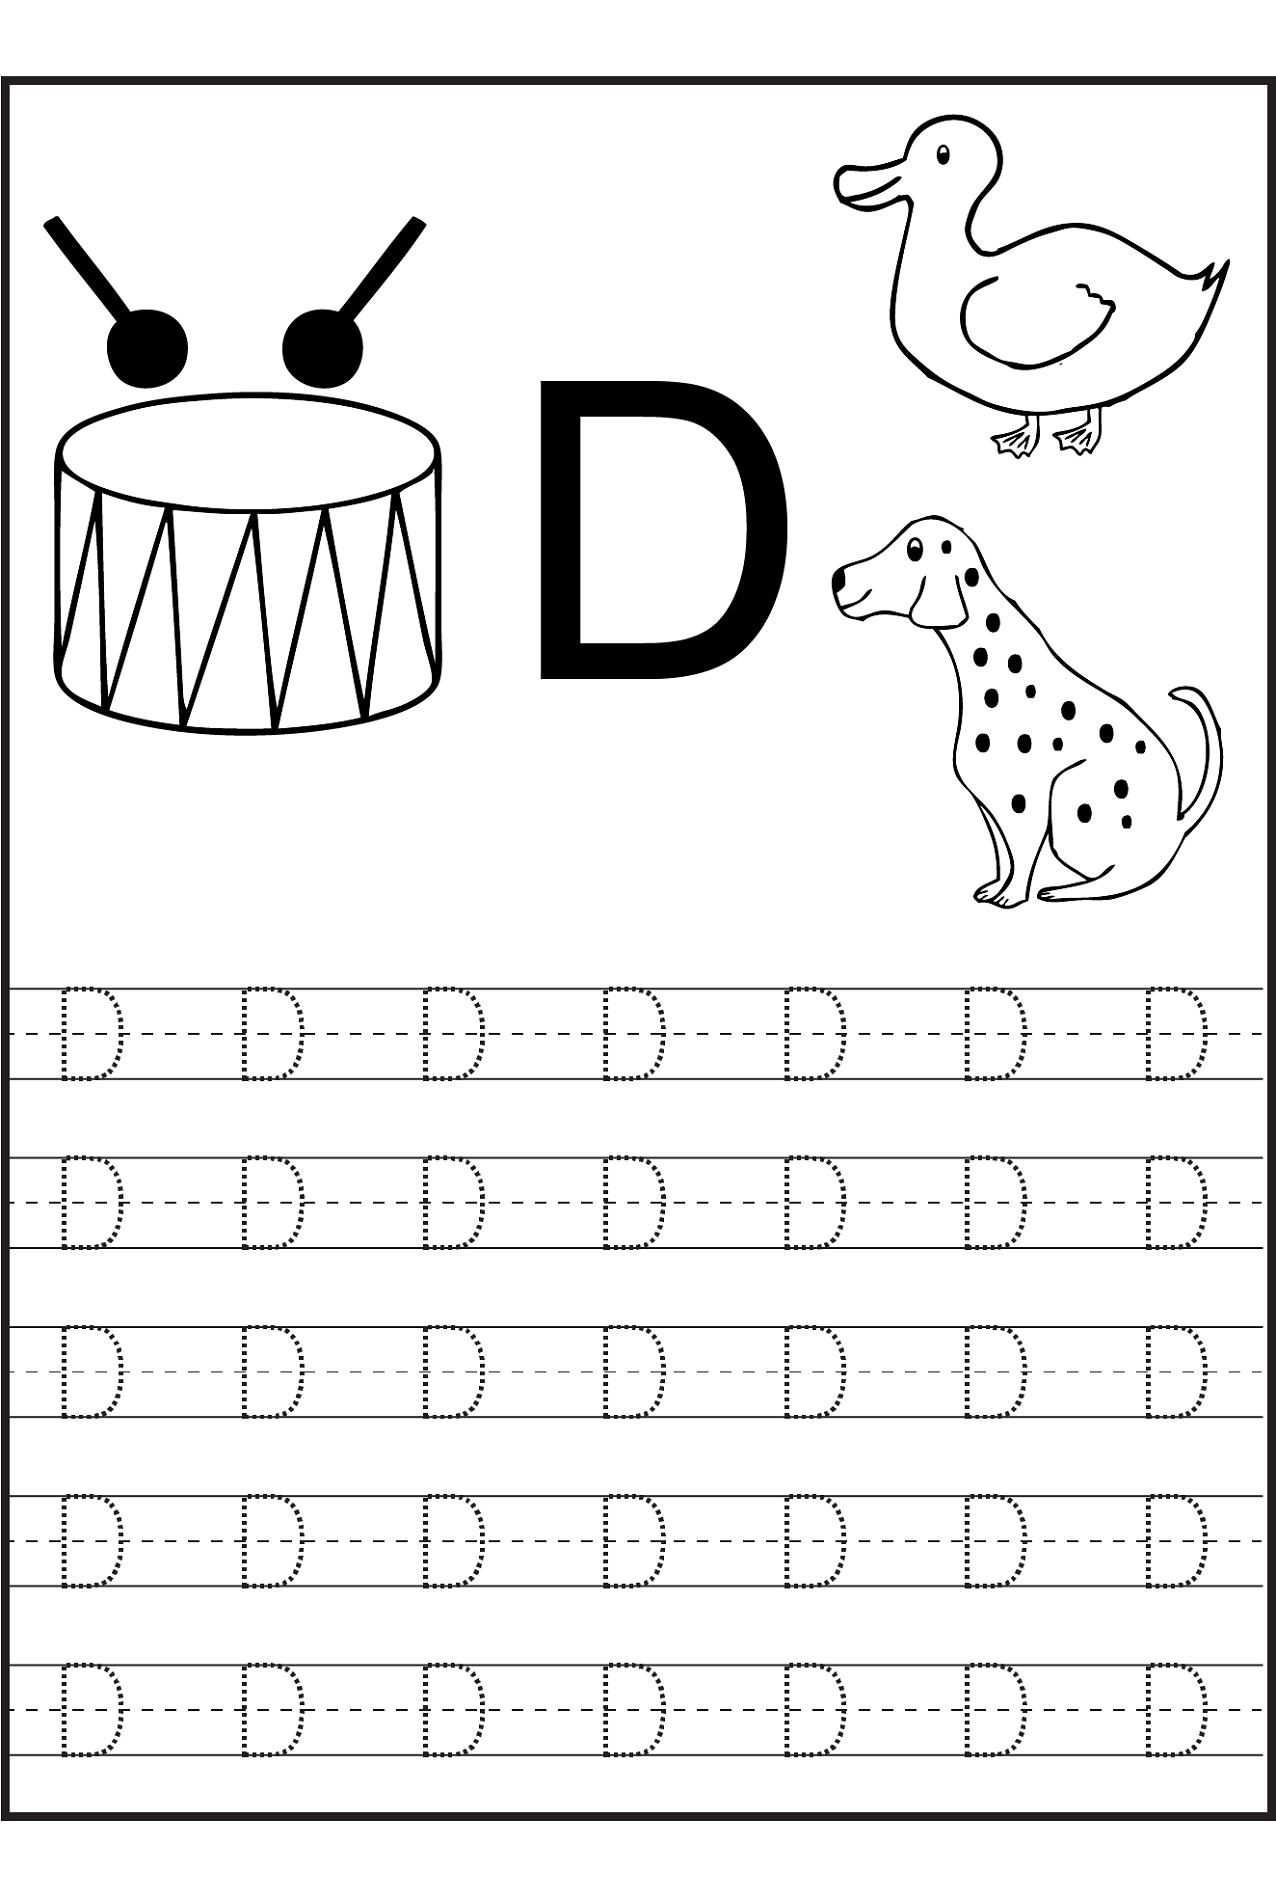 Trace Letter D Worksheets Activity Shelter | Alphabet in Letter Tracing Worksheets Editable